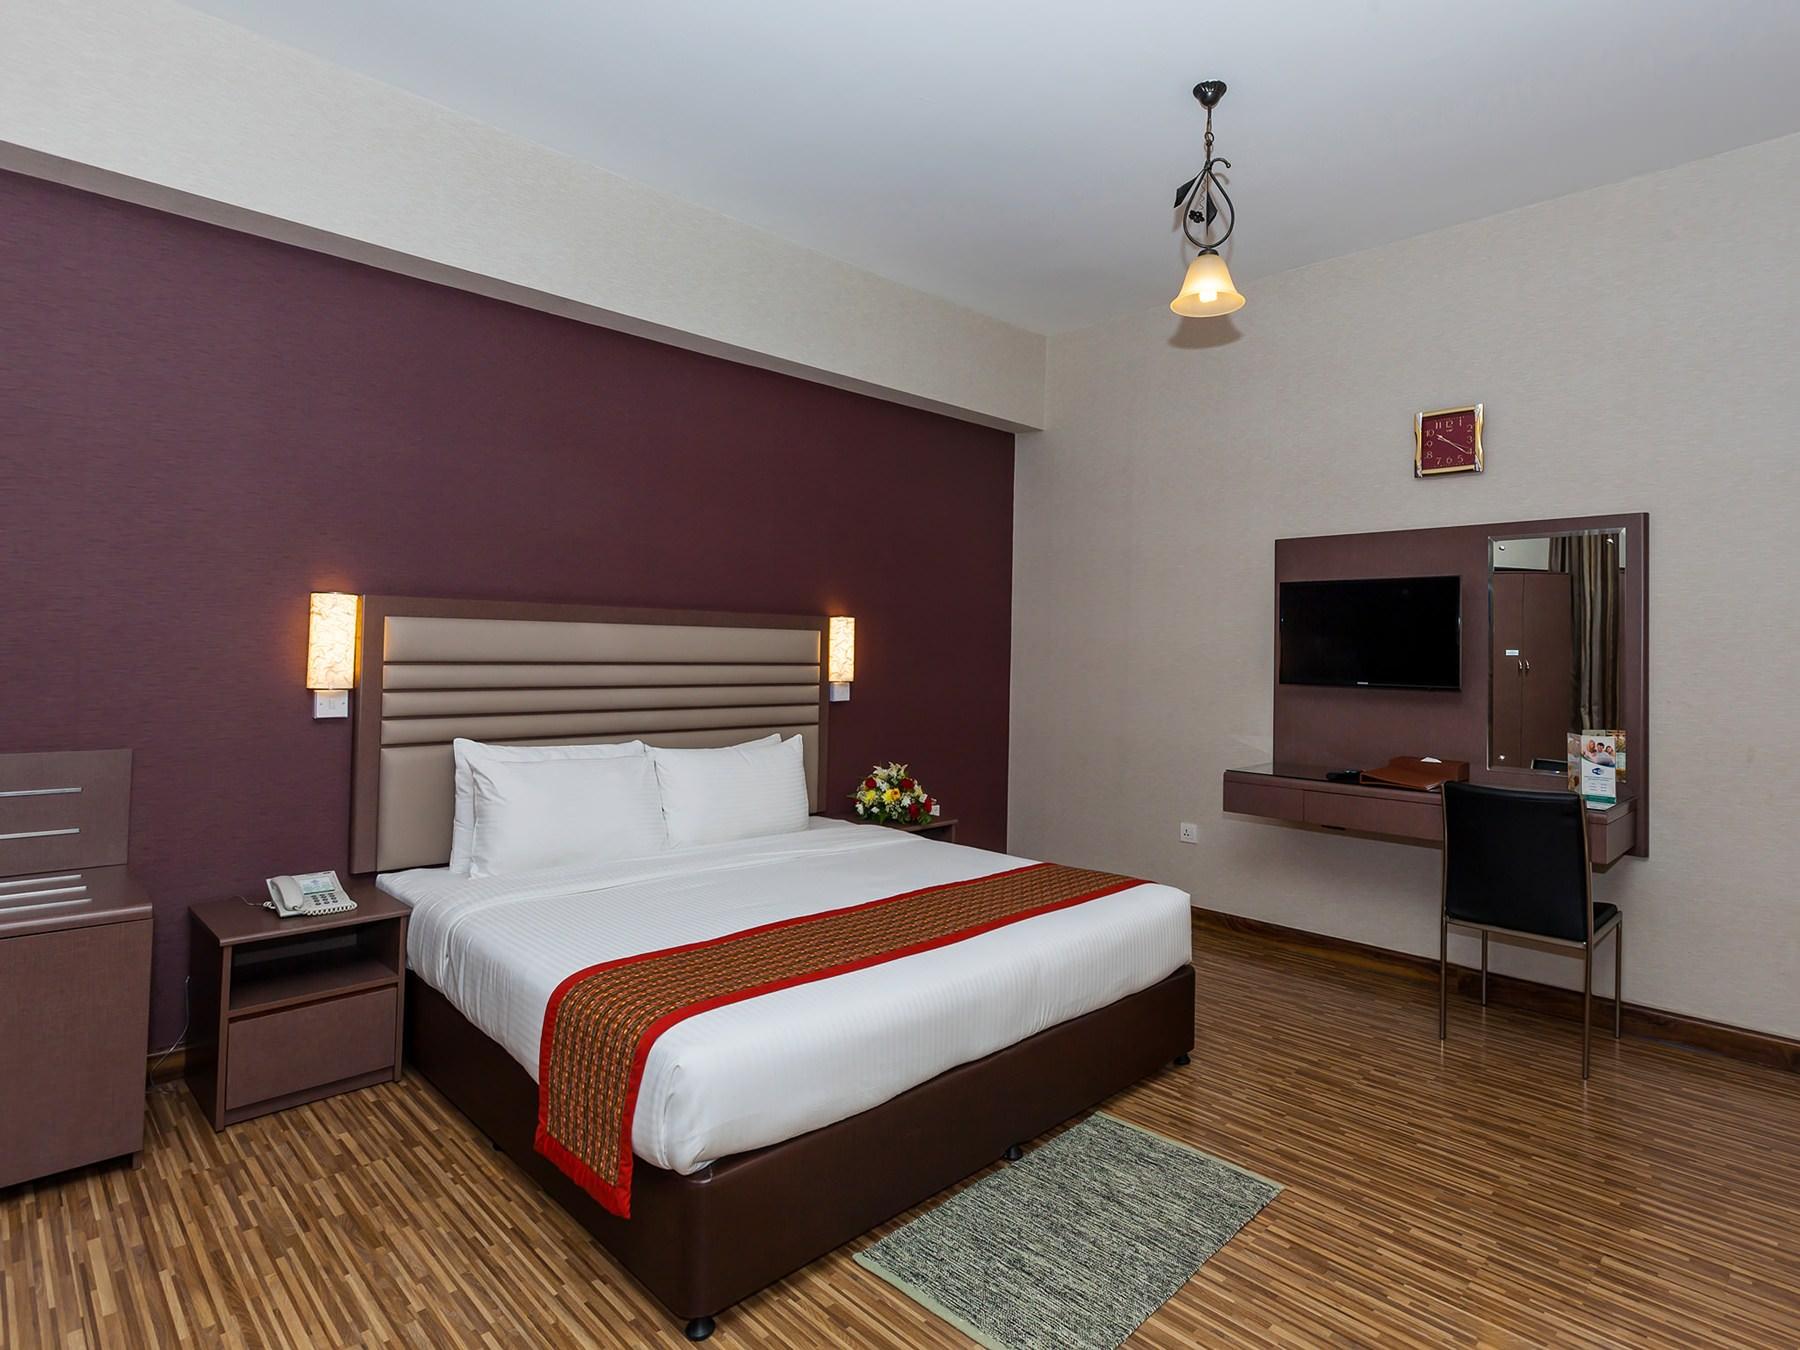 Florida International Hotel Deluxe Room